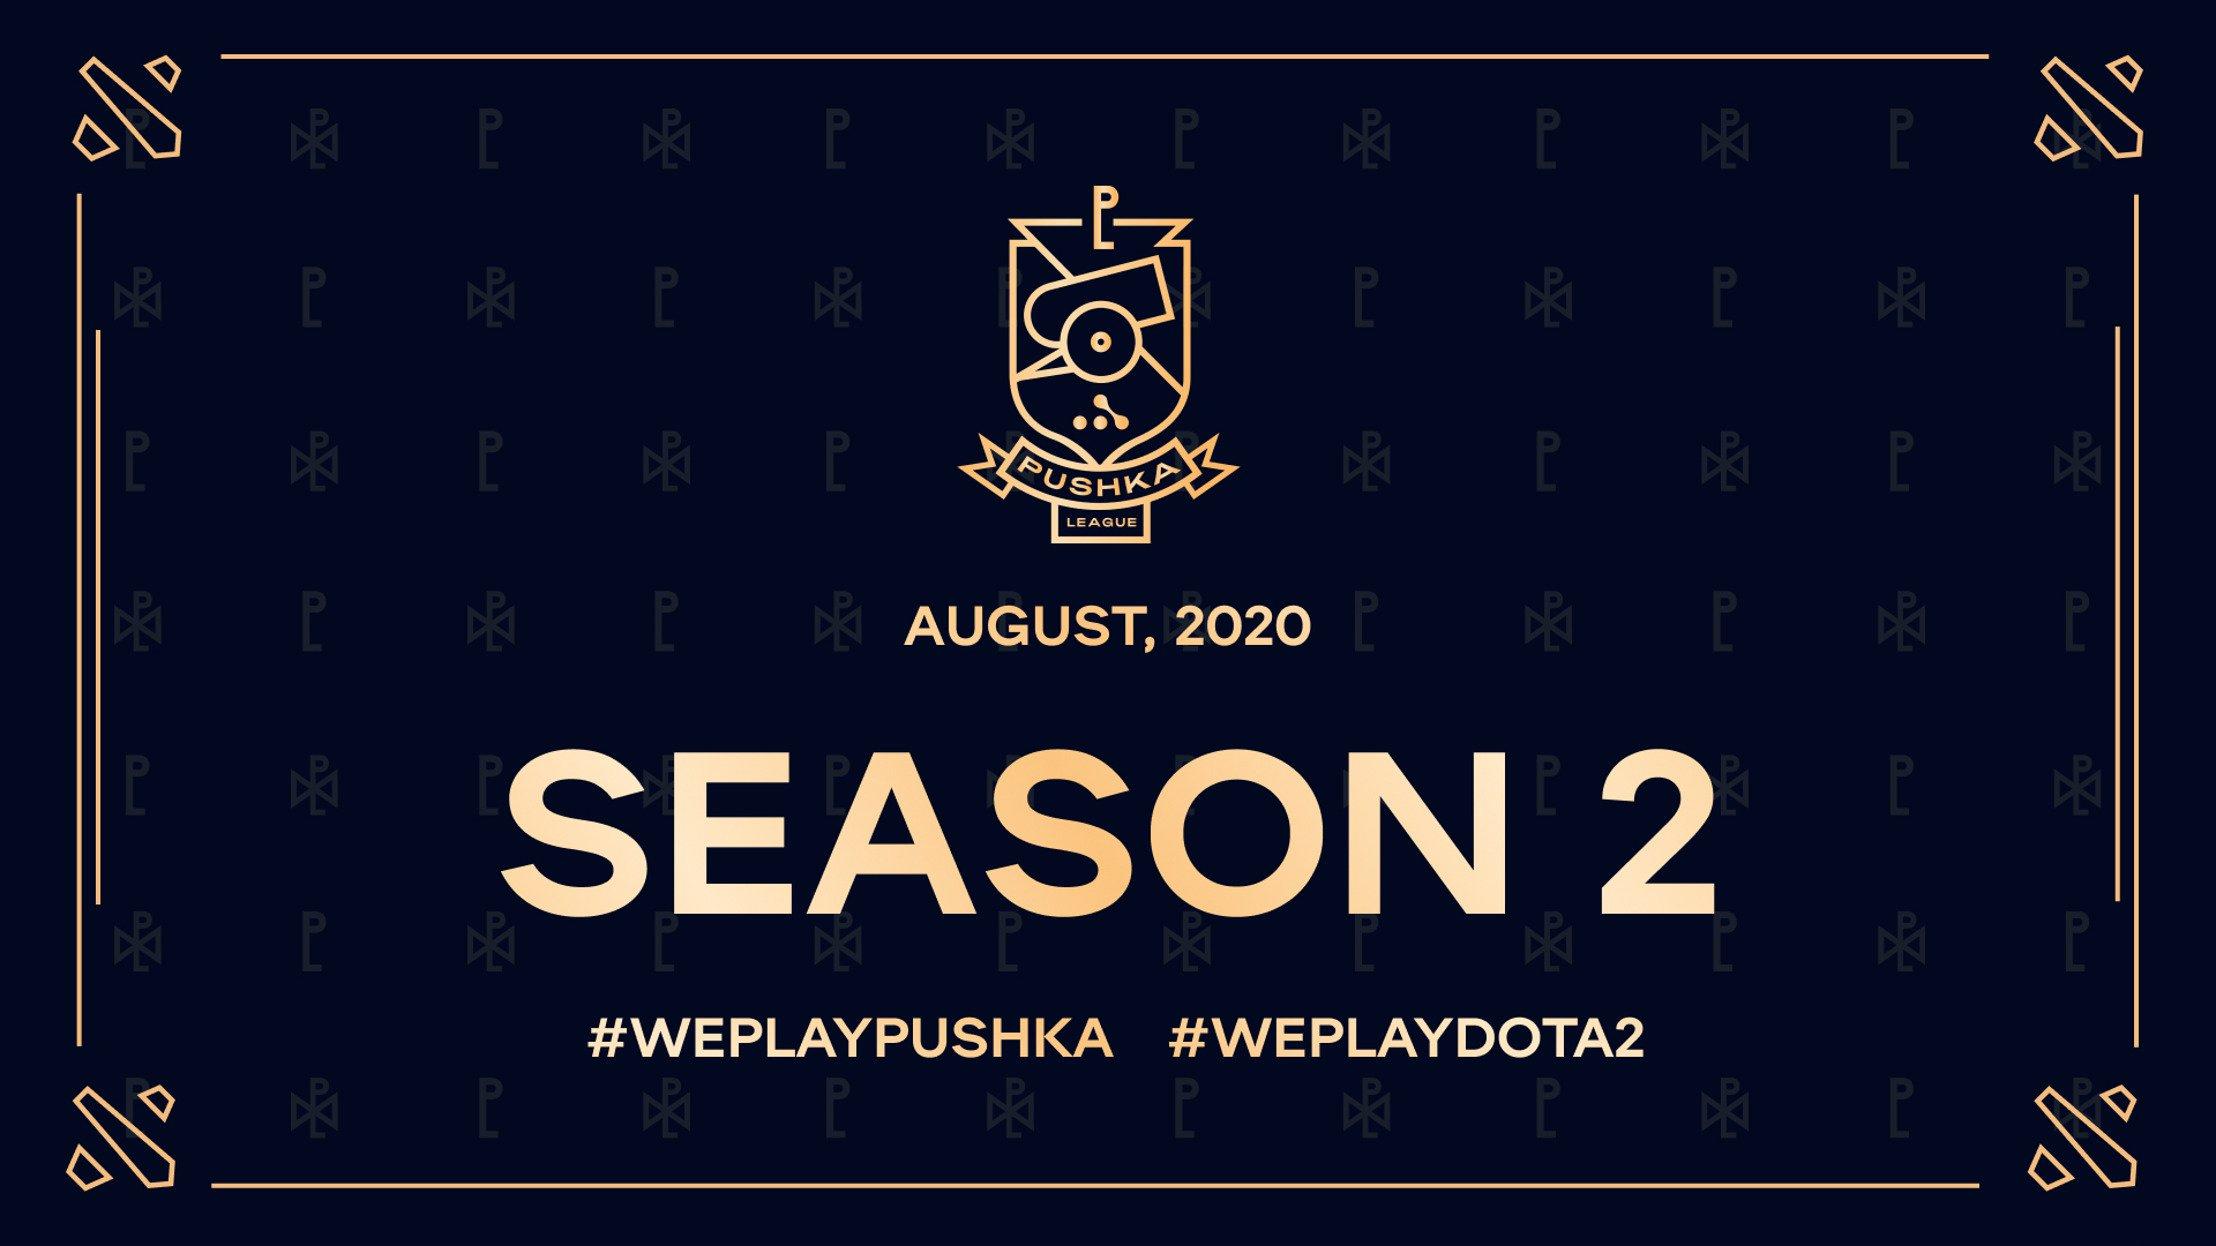 WePlay! Pushka League Season 2 announcement